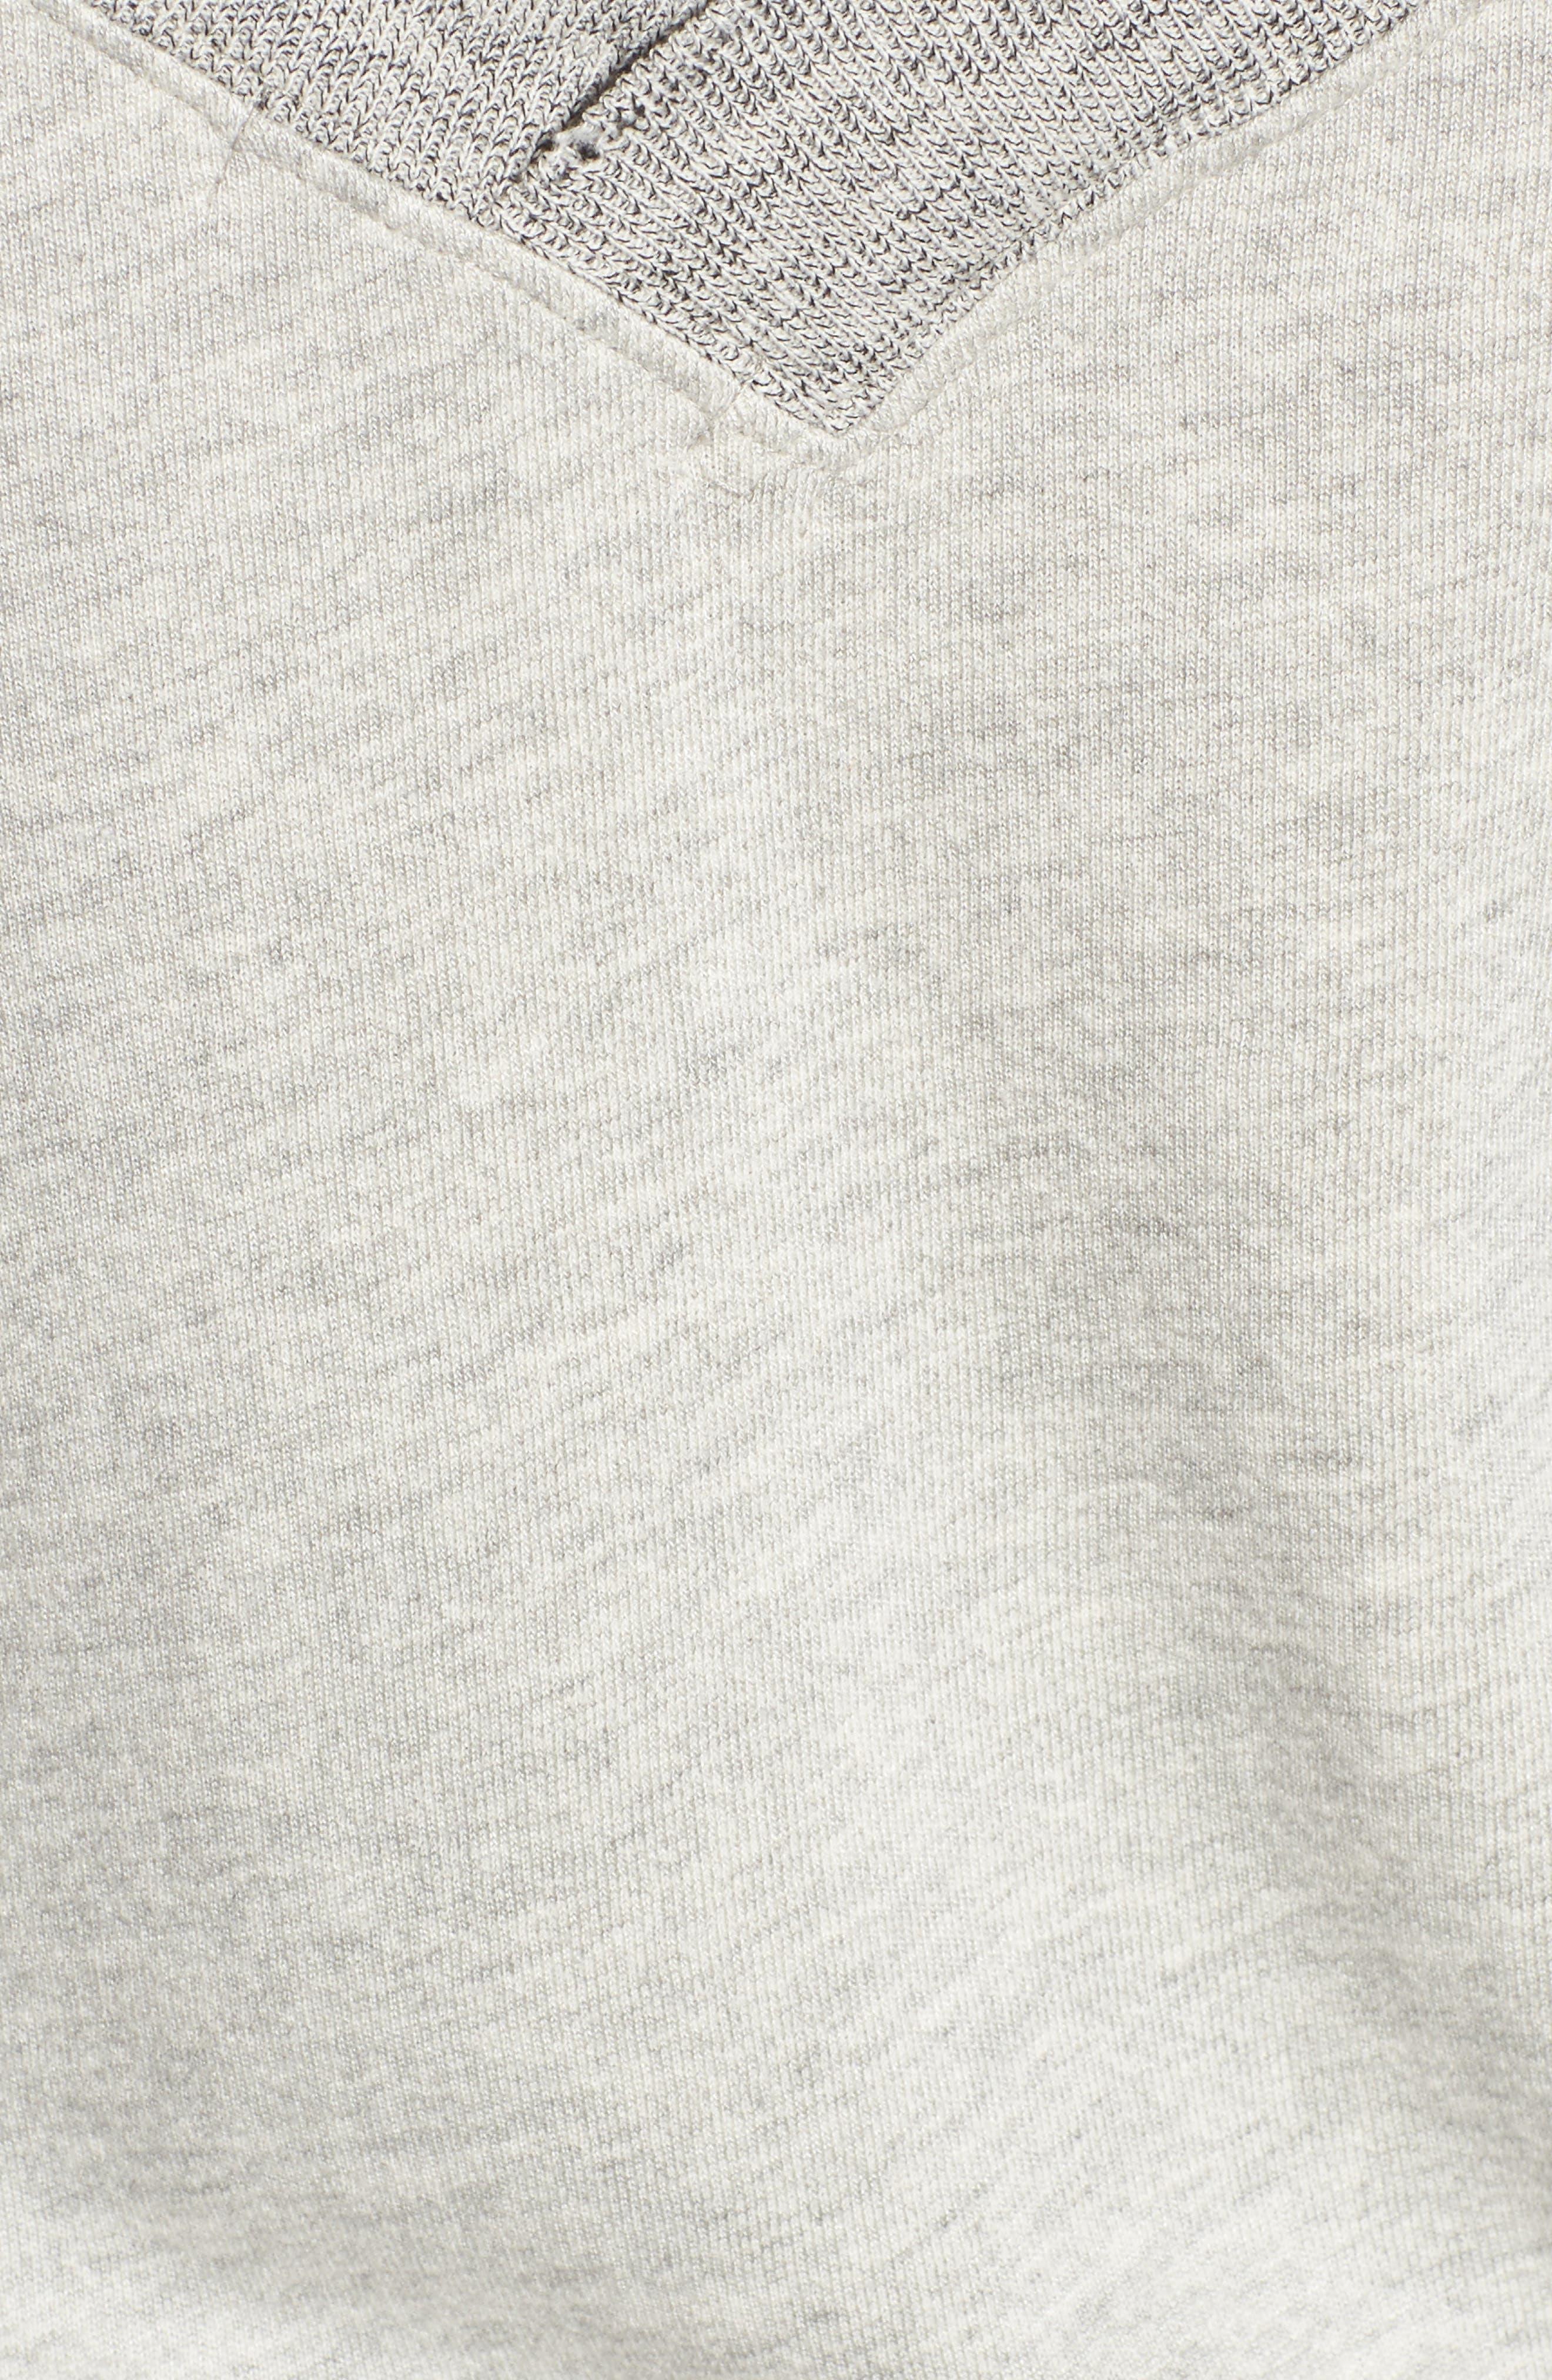 Mayer V-Neck Sweatshirt,                             Alternate thumbnail 5, color,                             Heather Grey